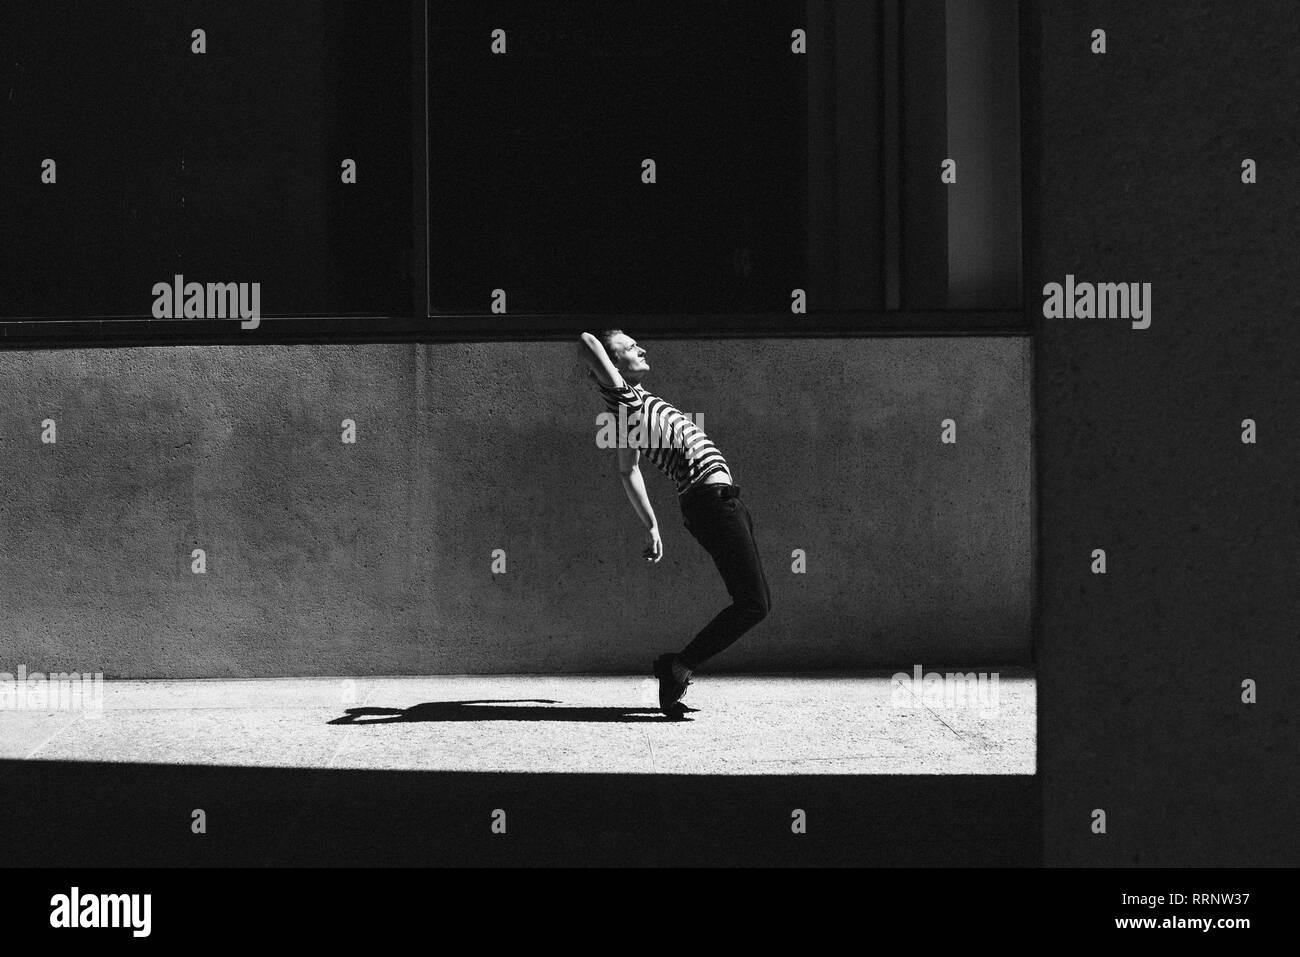 Young man dancing on urban sidewalk Stock Photo